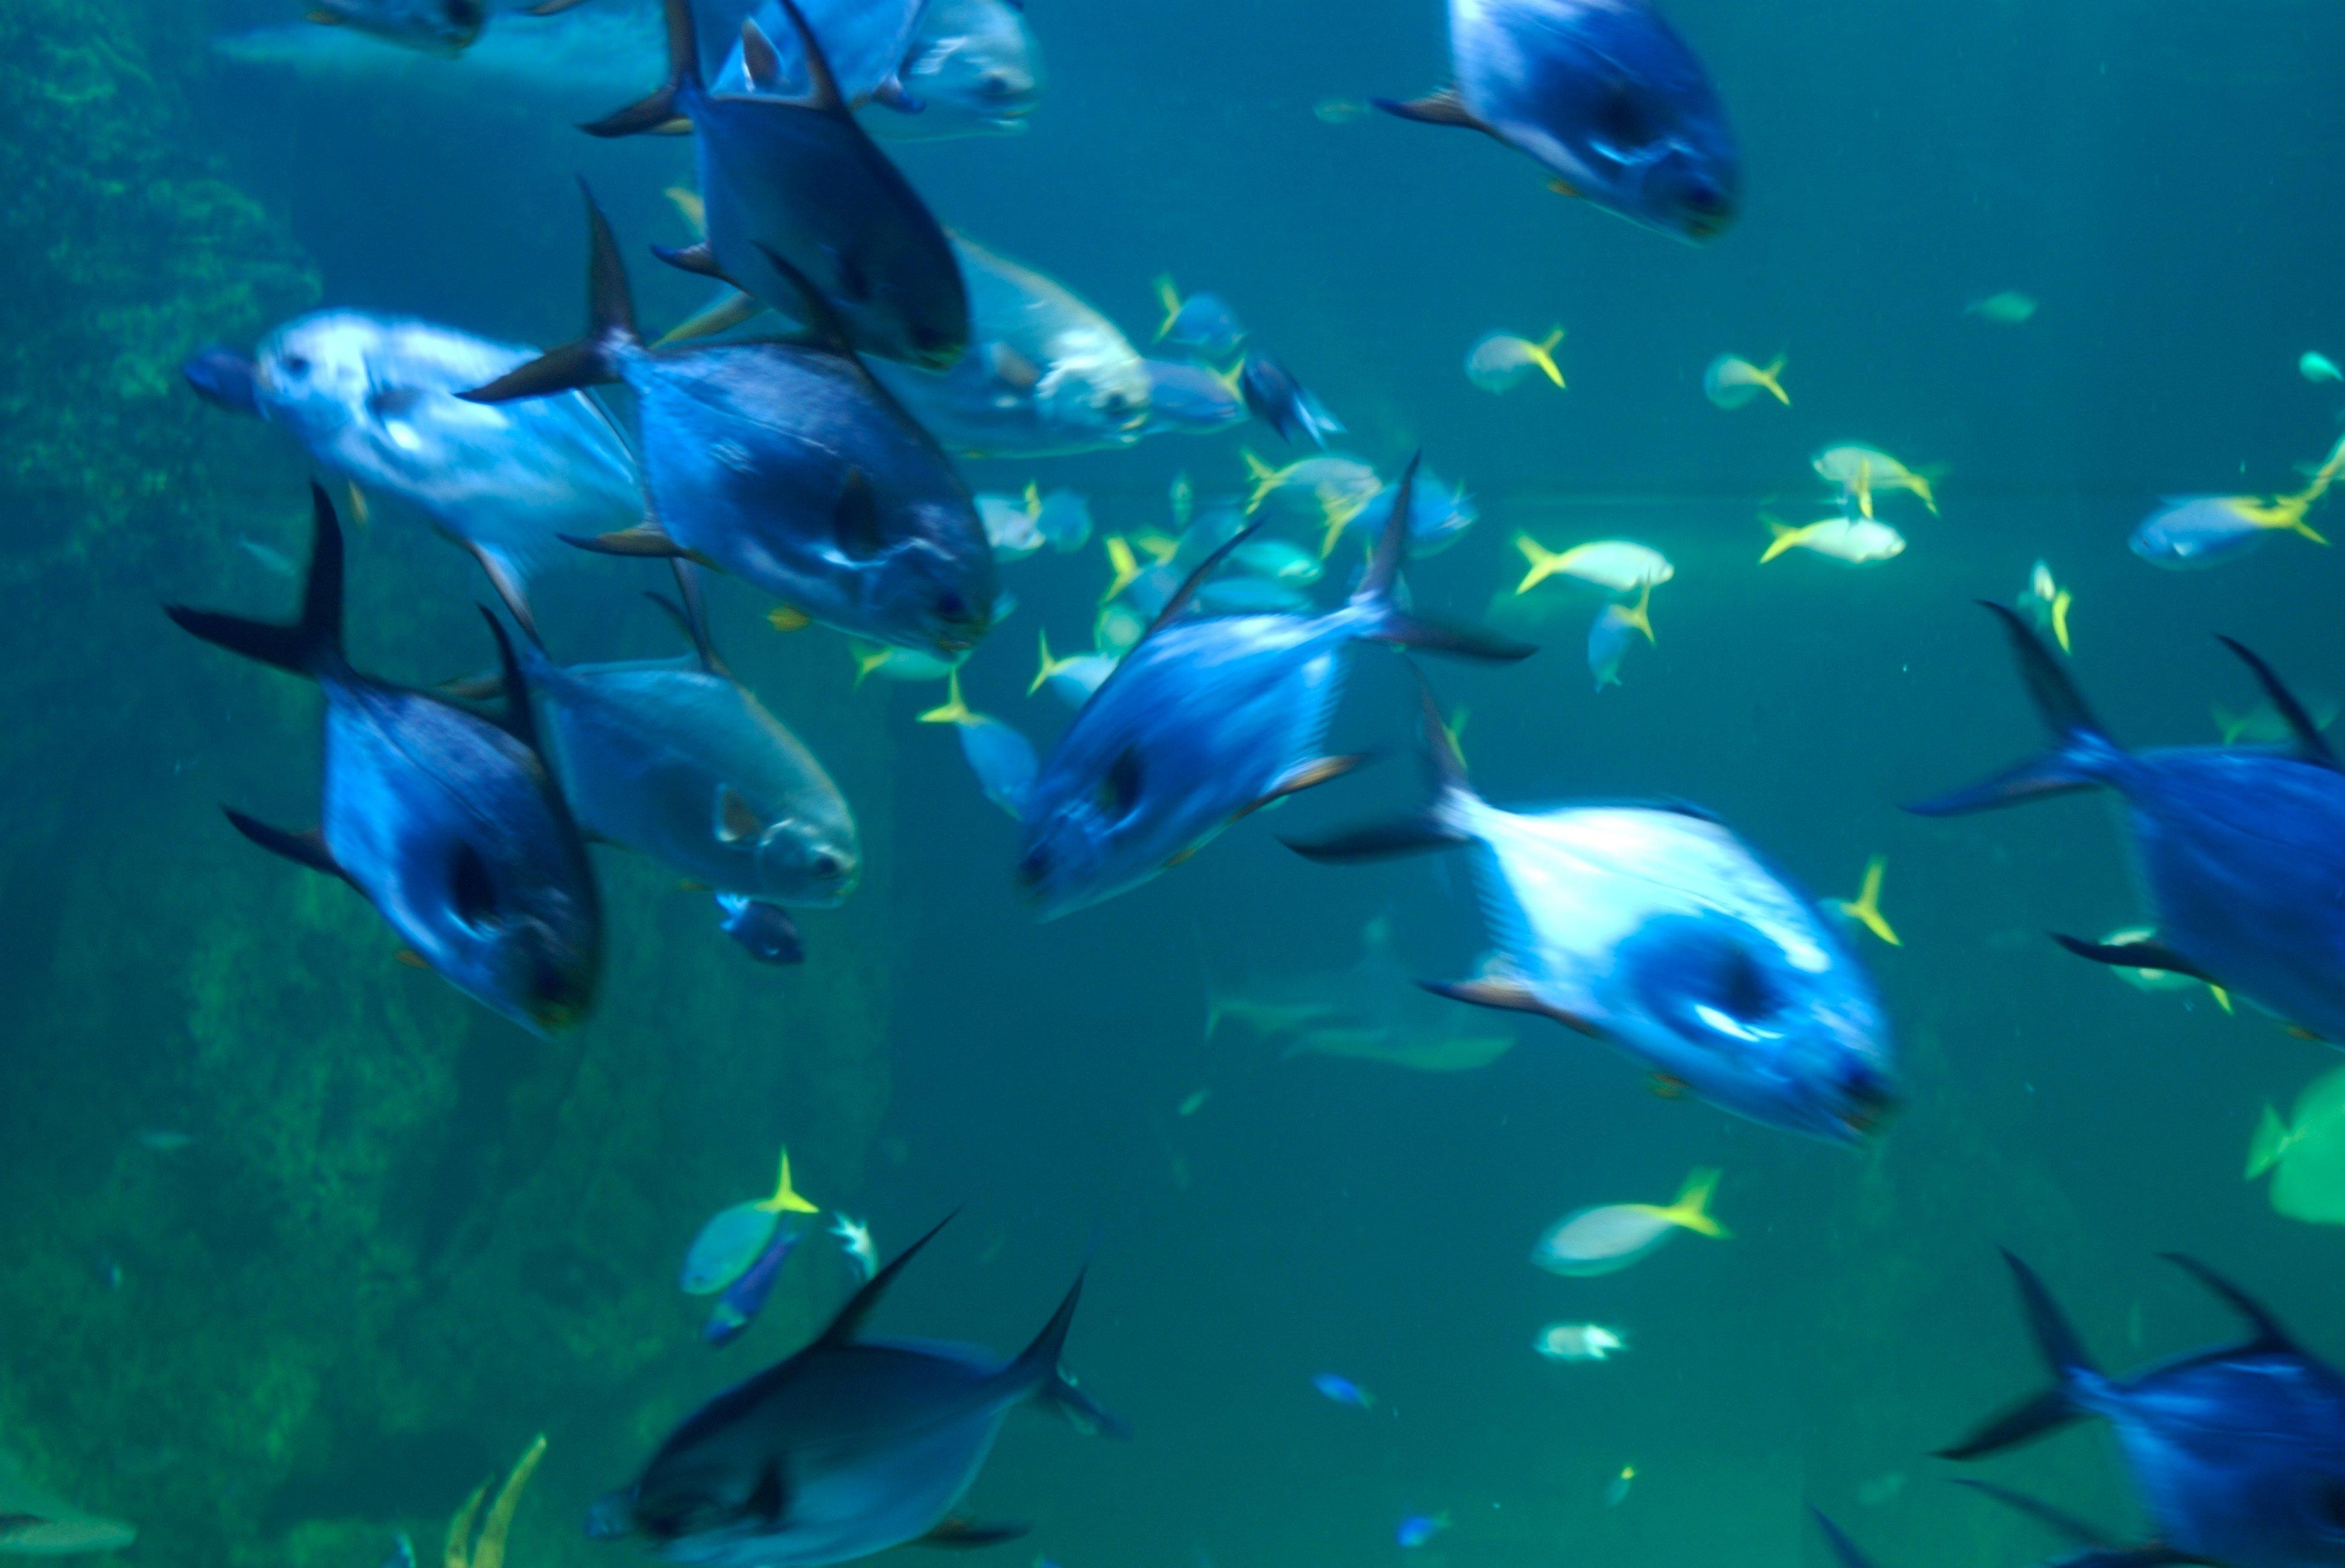 Cool fish backgrounds wallpapersafari for Cool fishing wallpapers